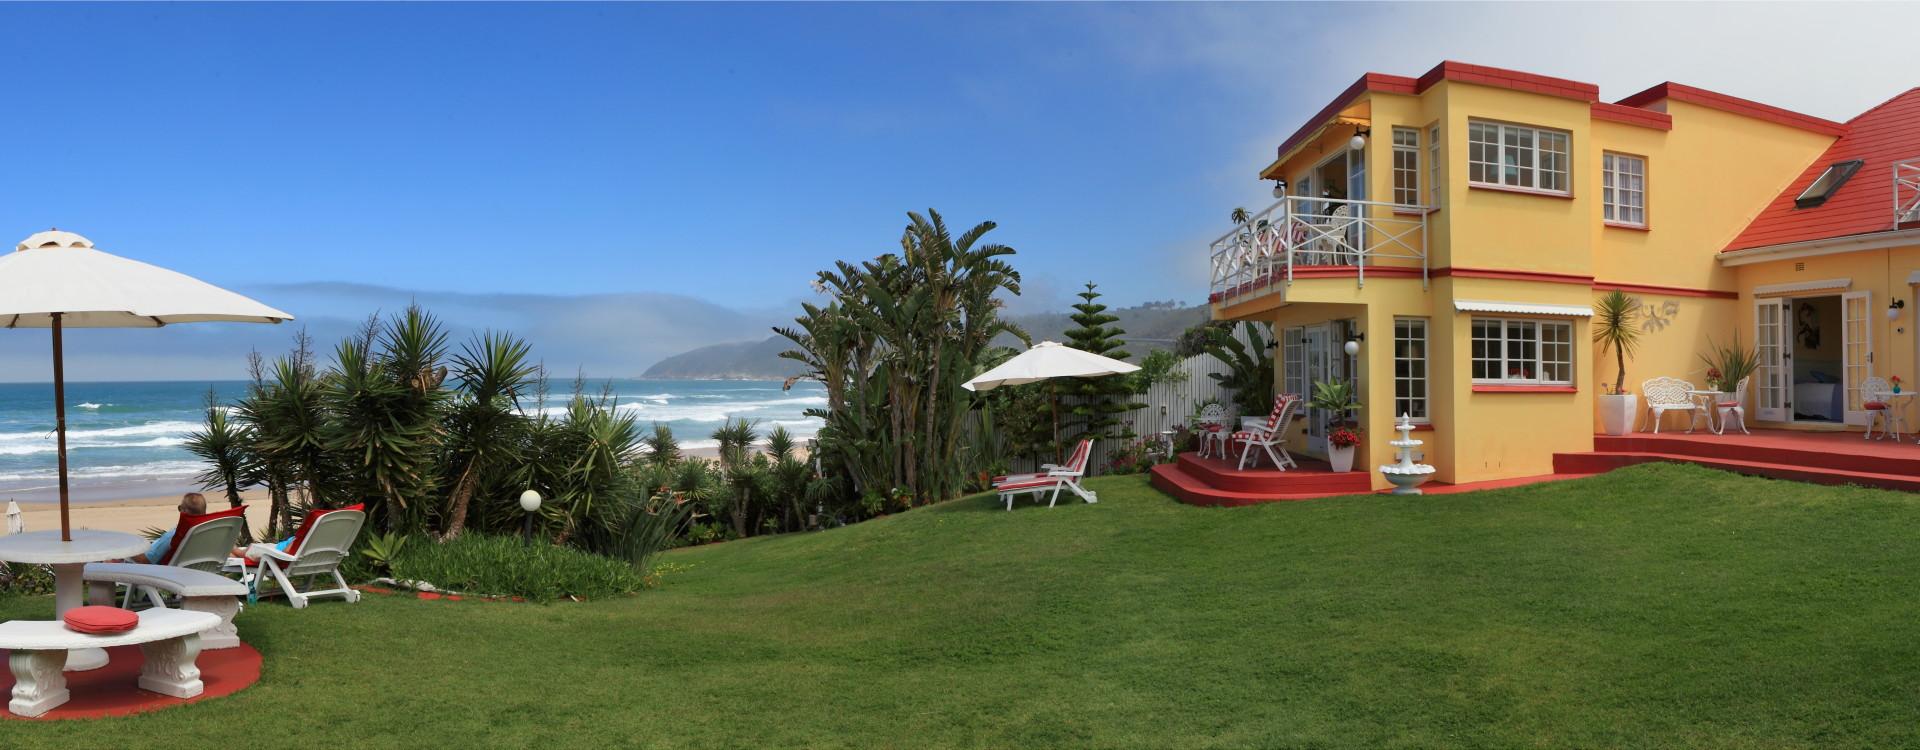 Haus am Strand.